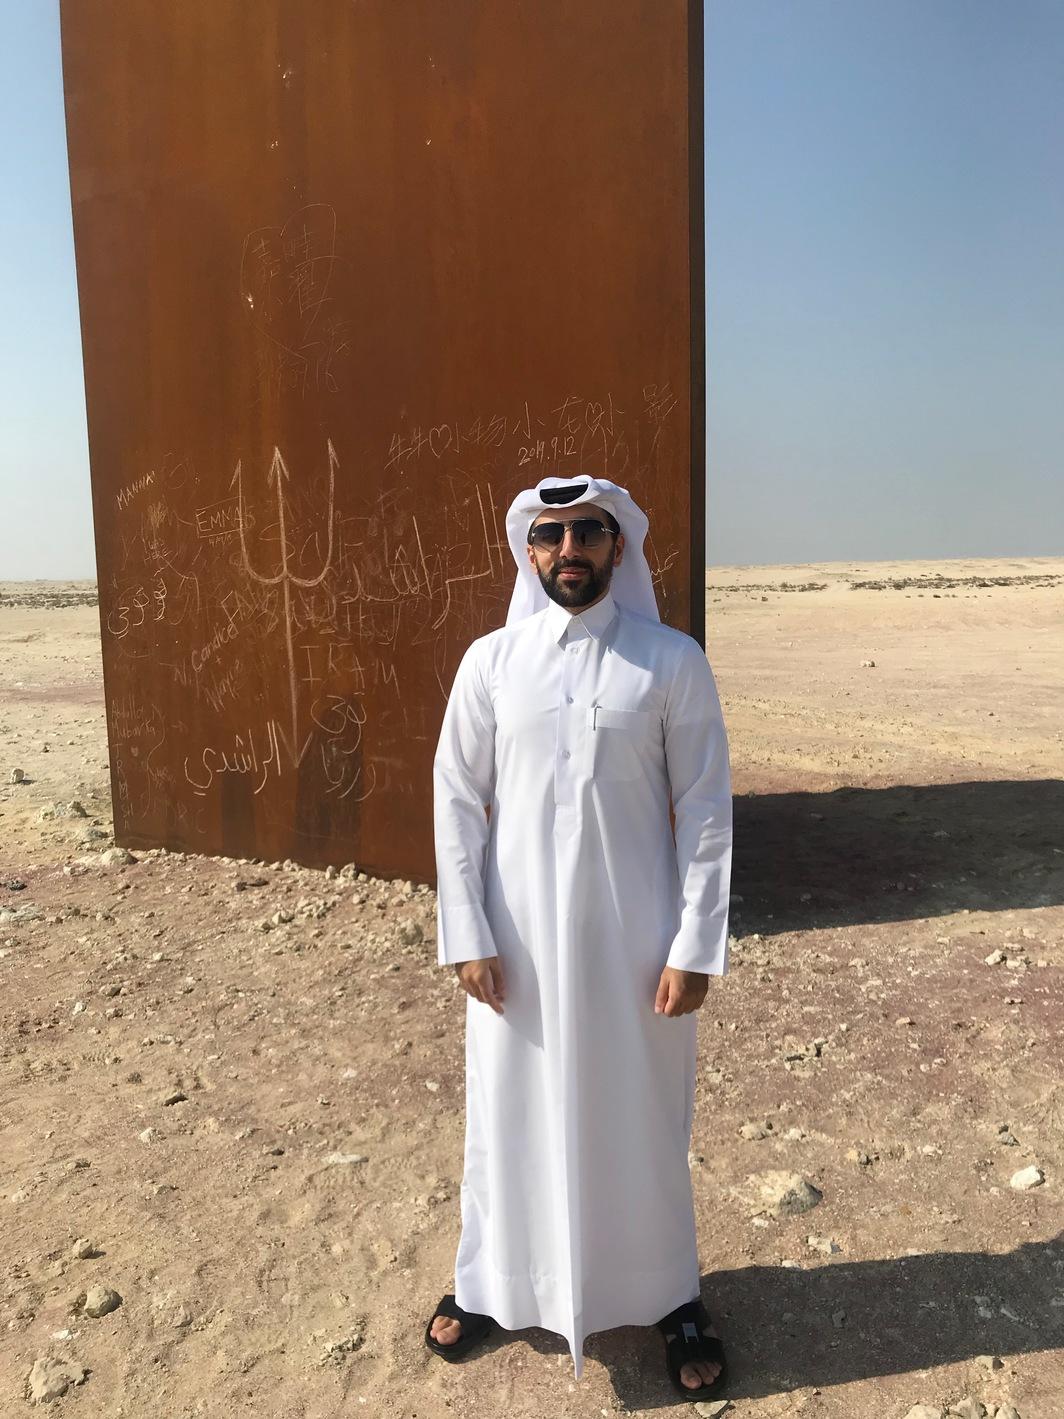 "Qatar Museums Public <a href='https://miifplus.com/tag/art/' target='_self' rel='nofollow' title='Art'>Art</a> Director Abdulrahman Al-Ishaq."" /><br /> Qatar Museums Public <a href='https://miifplus.com/tag/art/' target='_self' rel='nofollow' title='Art'>Art</a> Director Abdulrahman Al-Ishaq. </div> </div> <div class="